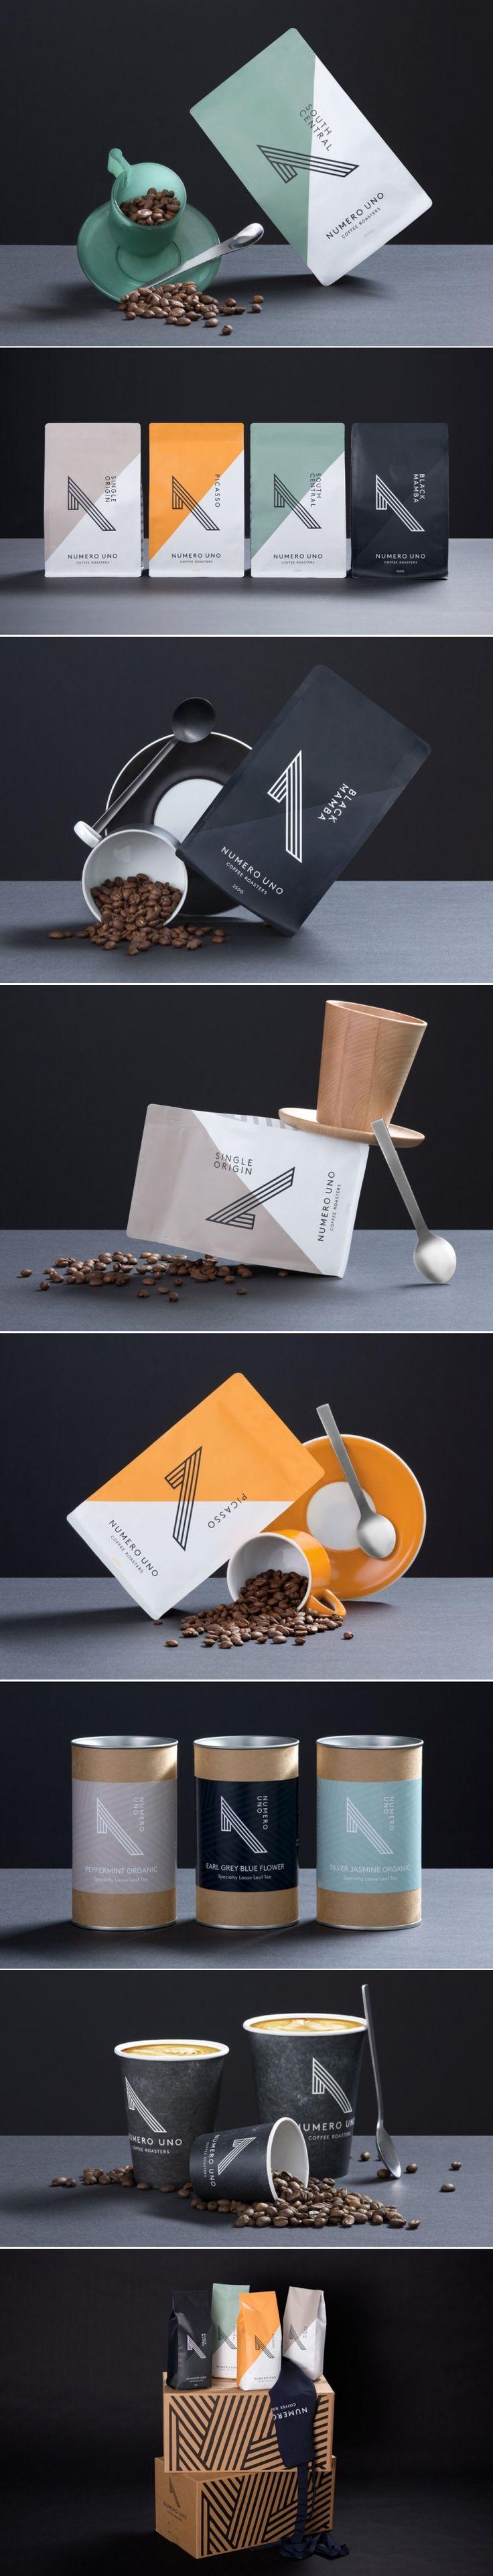 Numero Uno is a Striking Coffee Brand — The Dieline | Packaging & Branding Design & Innovation News